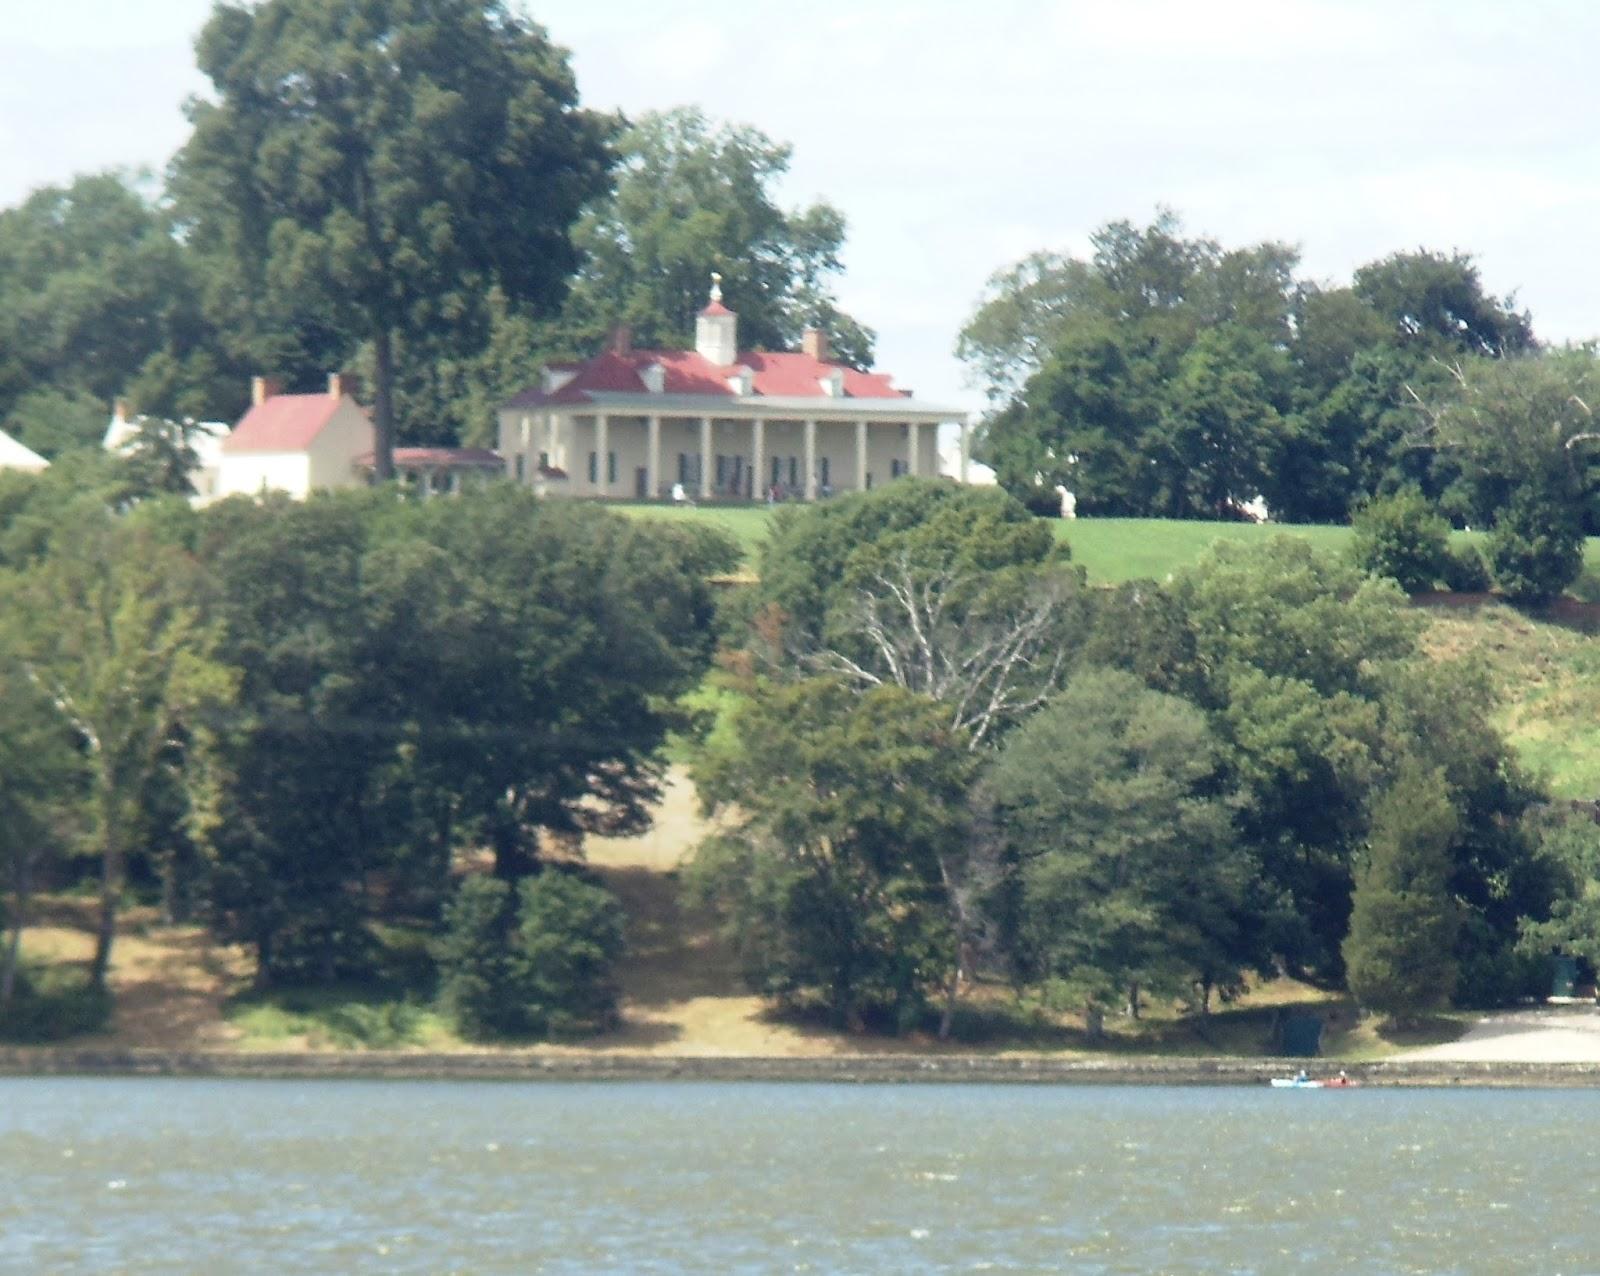 Rear view of Mount Vernon